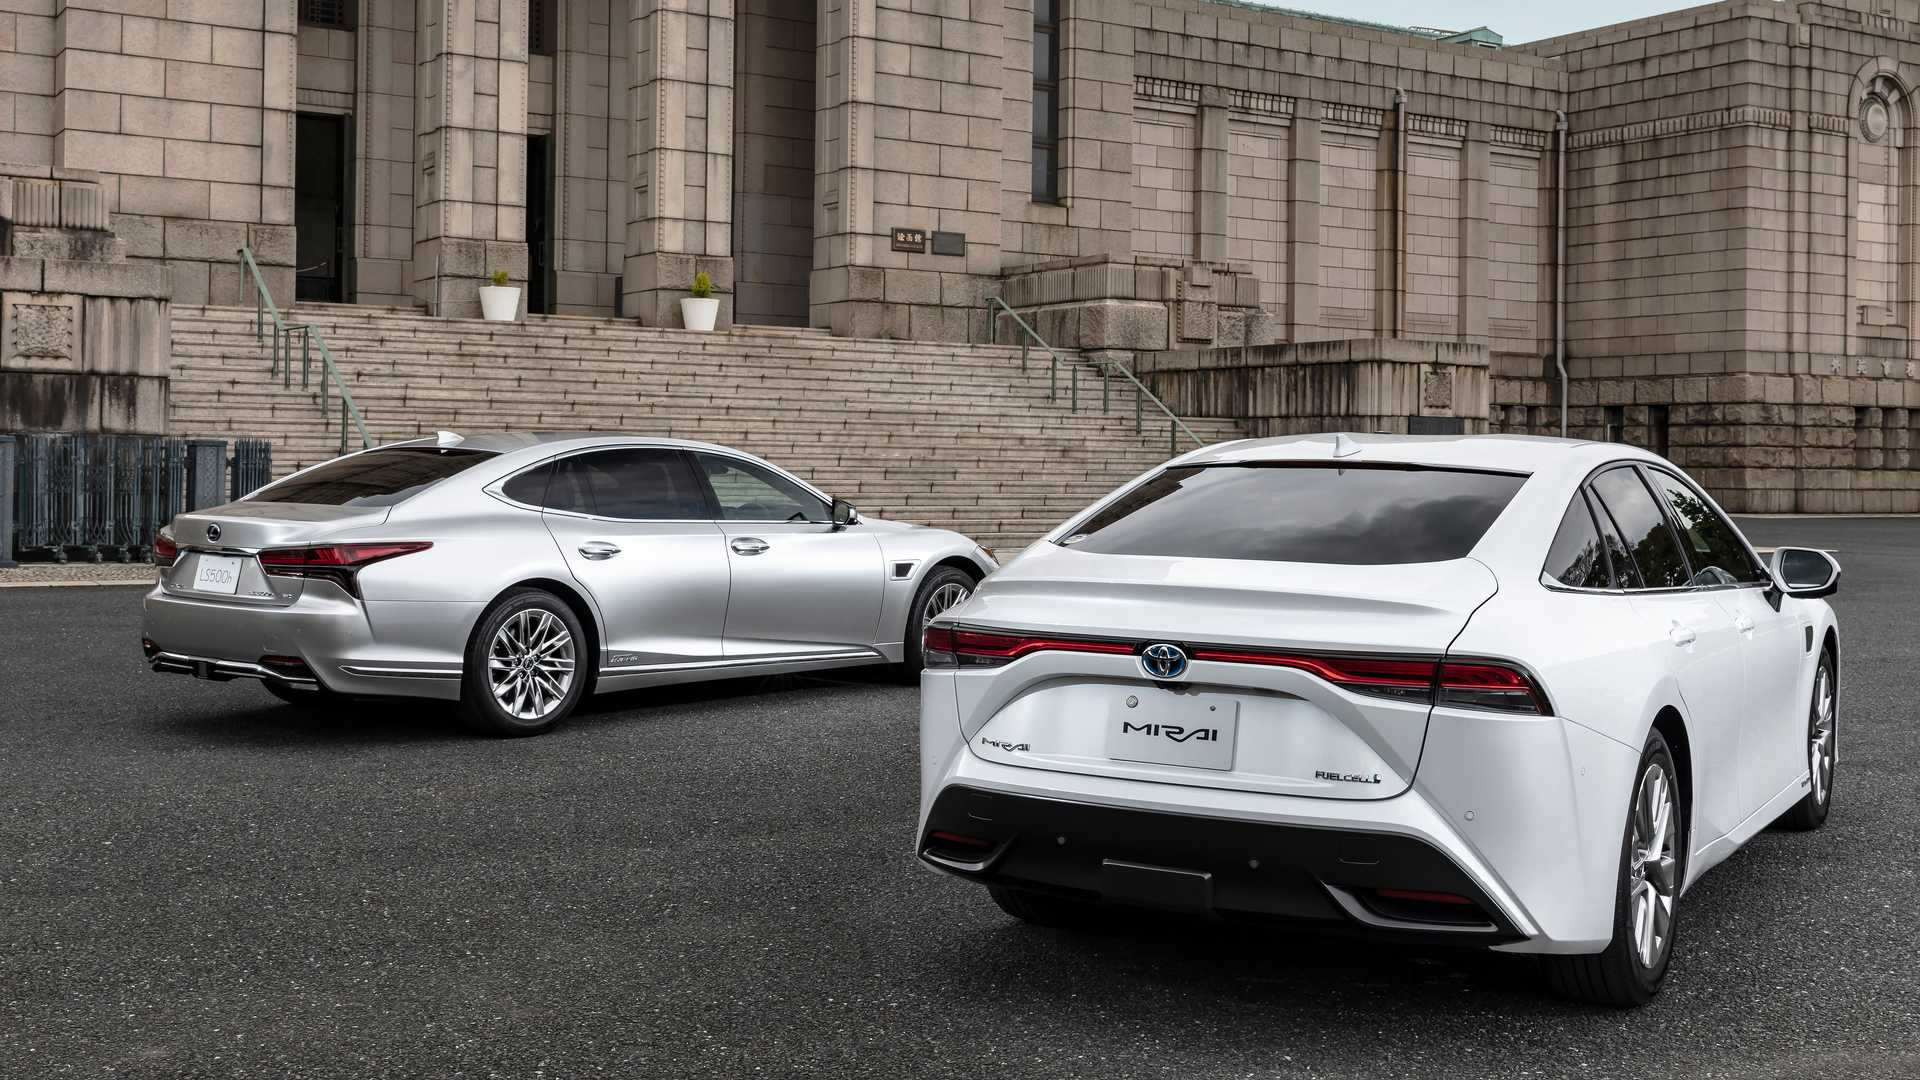 Lexus-LS-And-Toyota-Mirai-Advanced-Drive-4